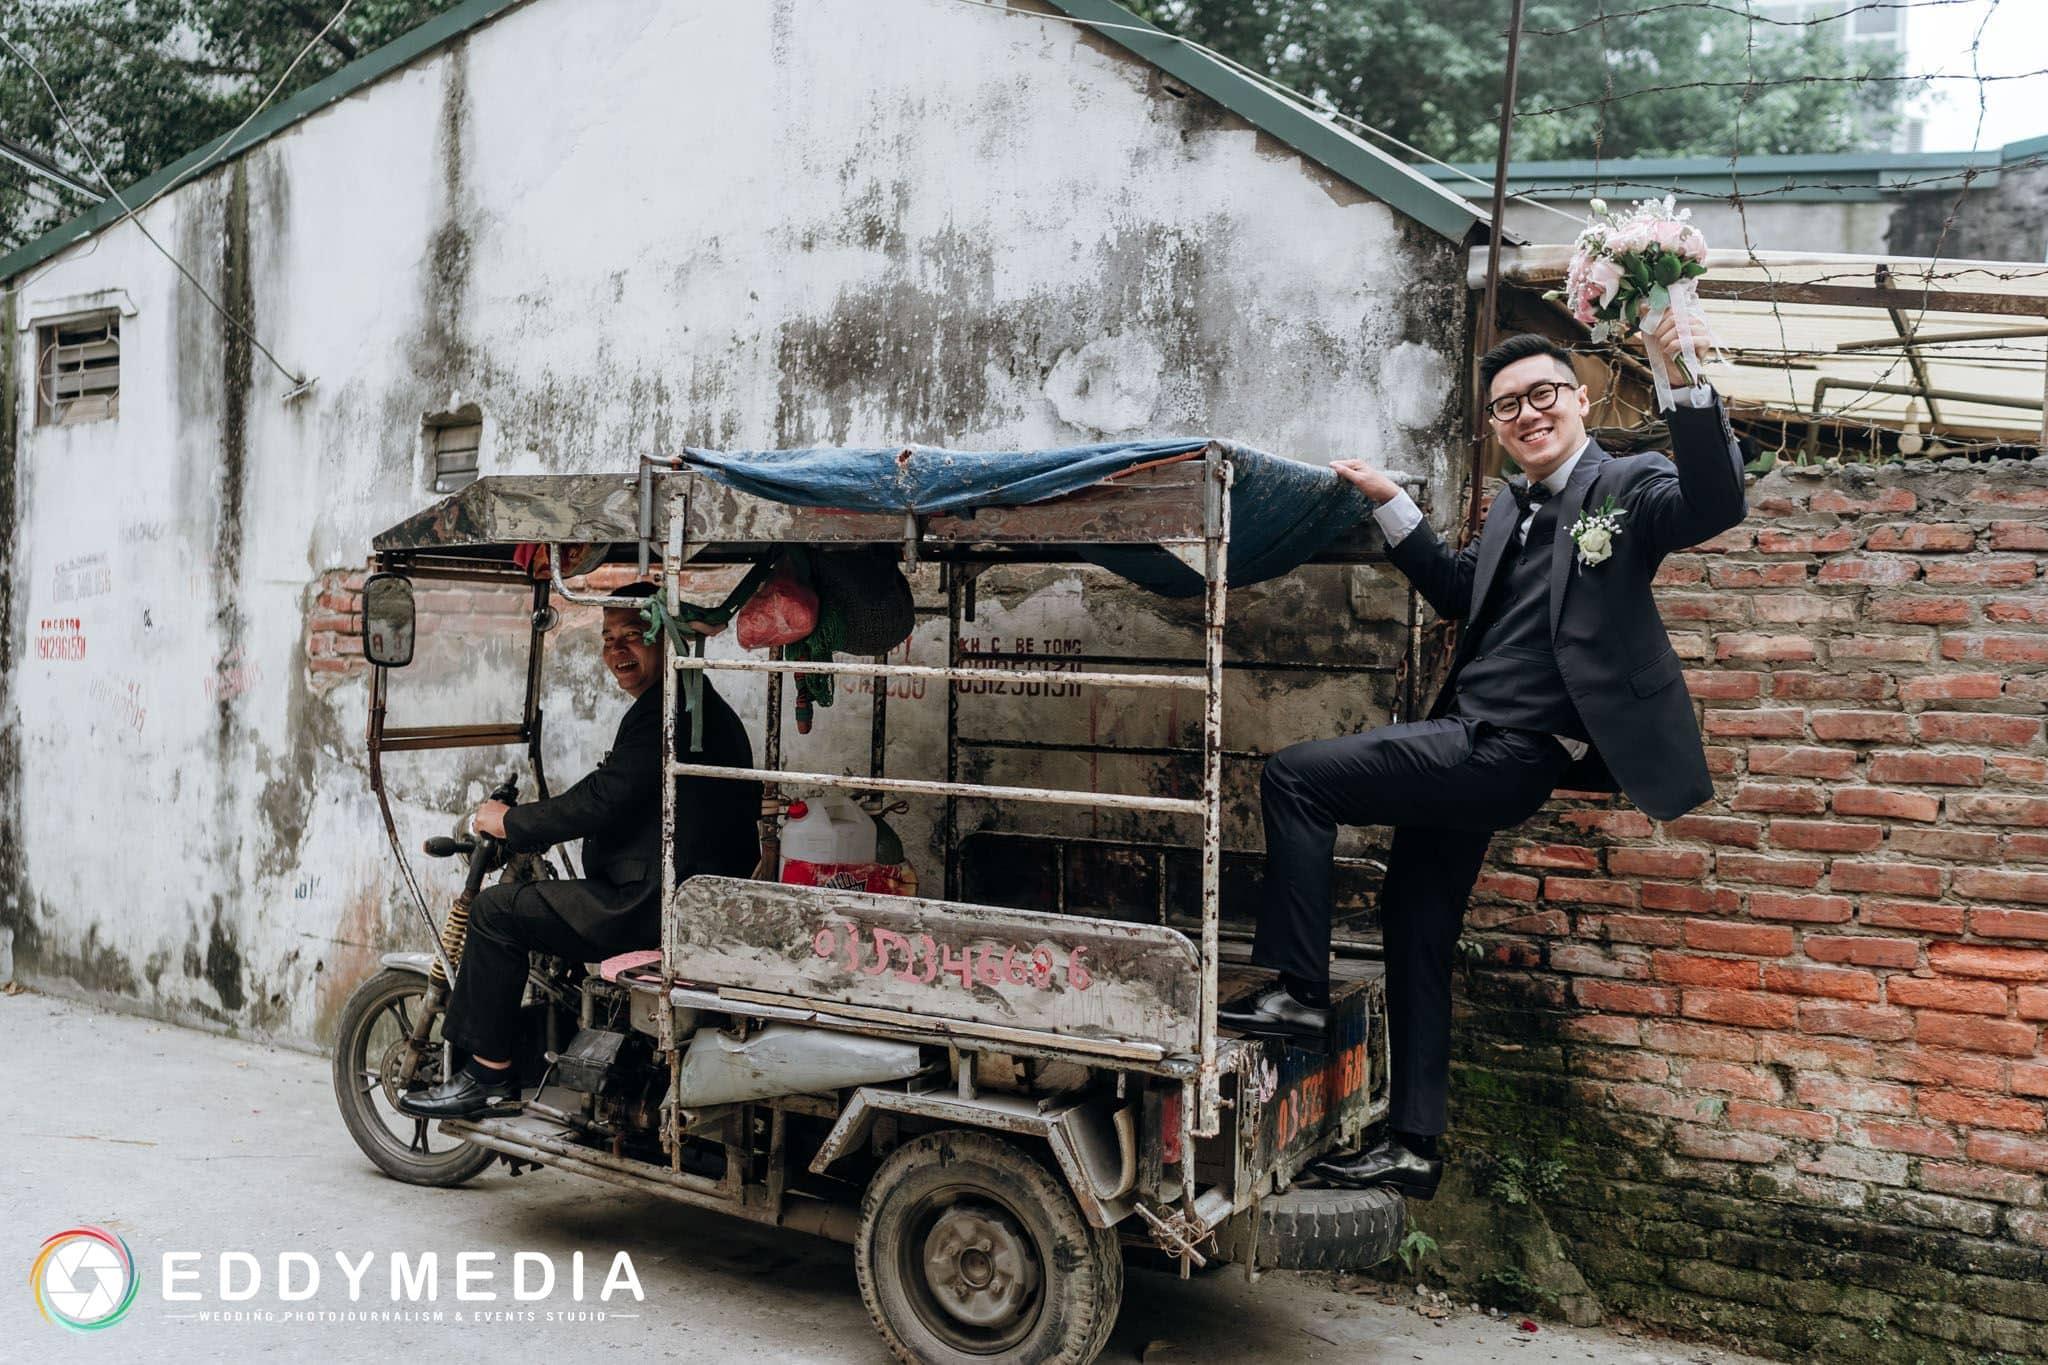 Phongsucuoi Vuduc KhanhLy EddyMedia 50 Photos by Hoài Nam